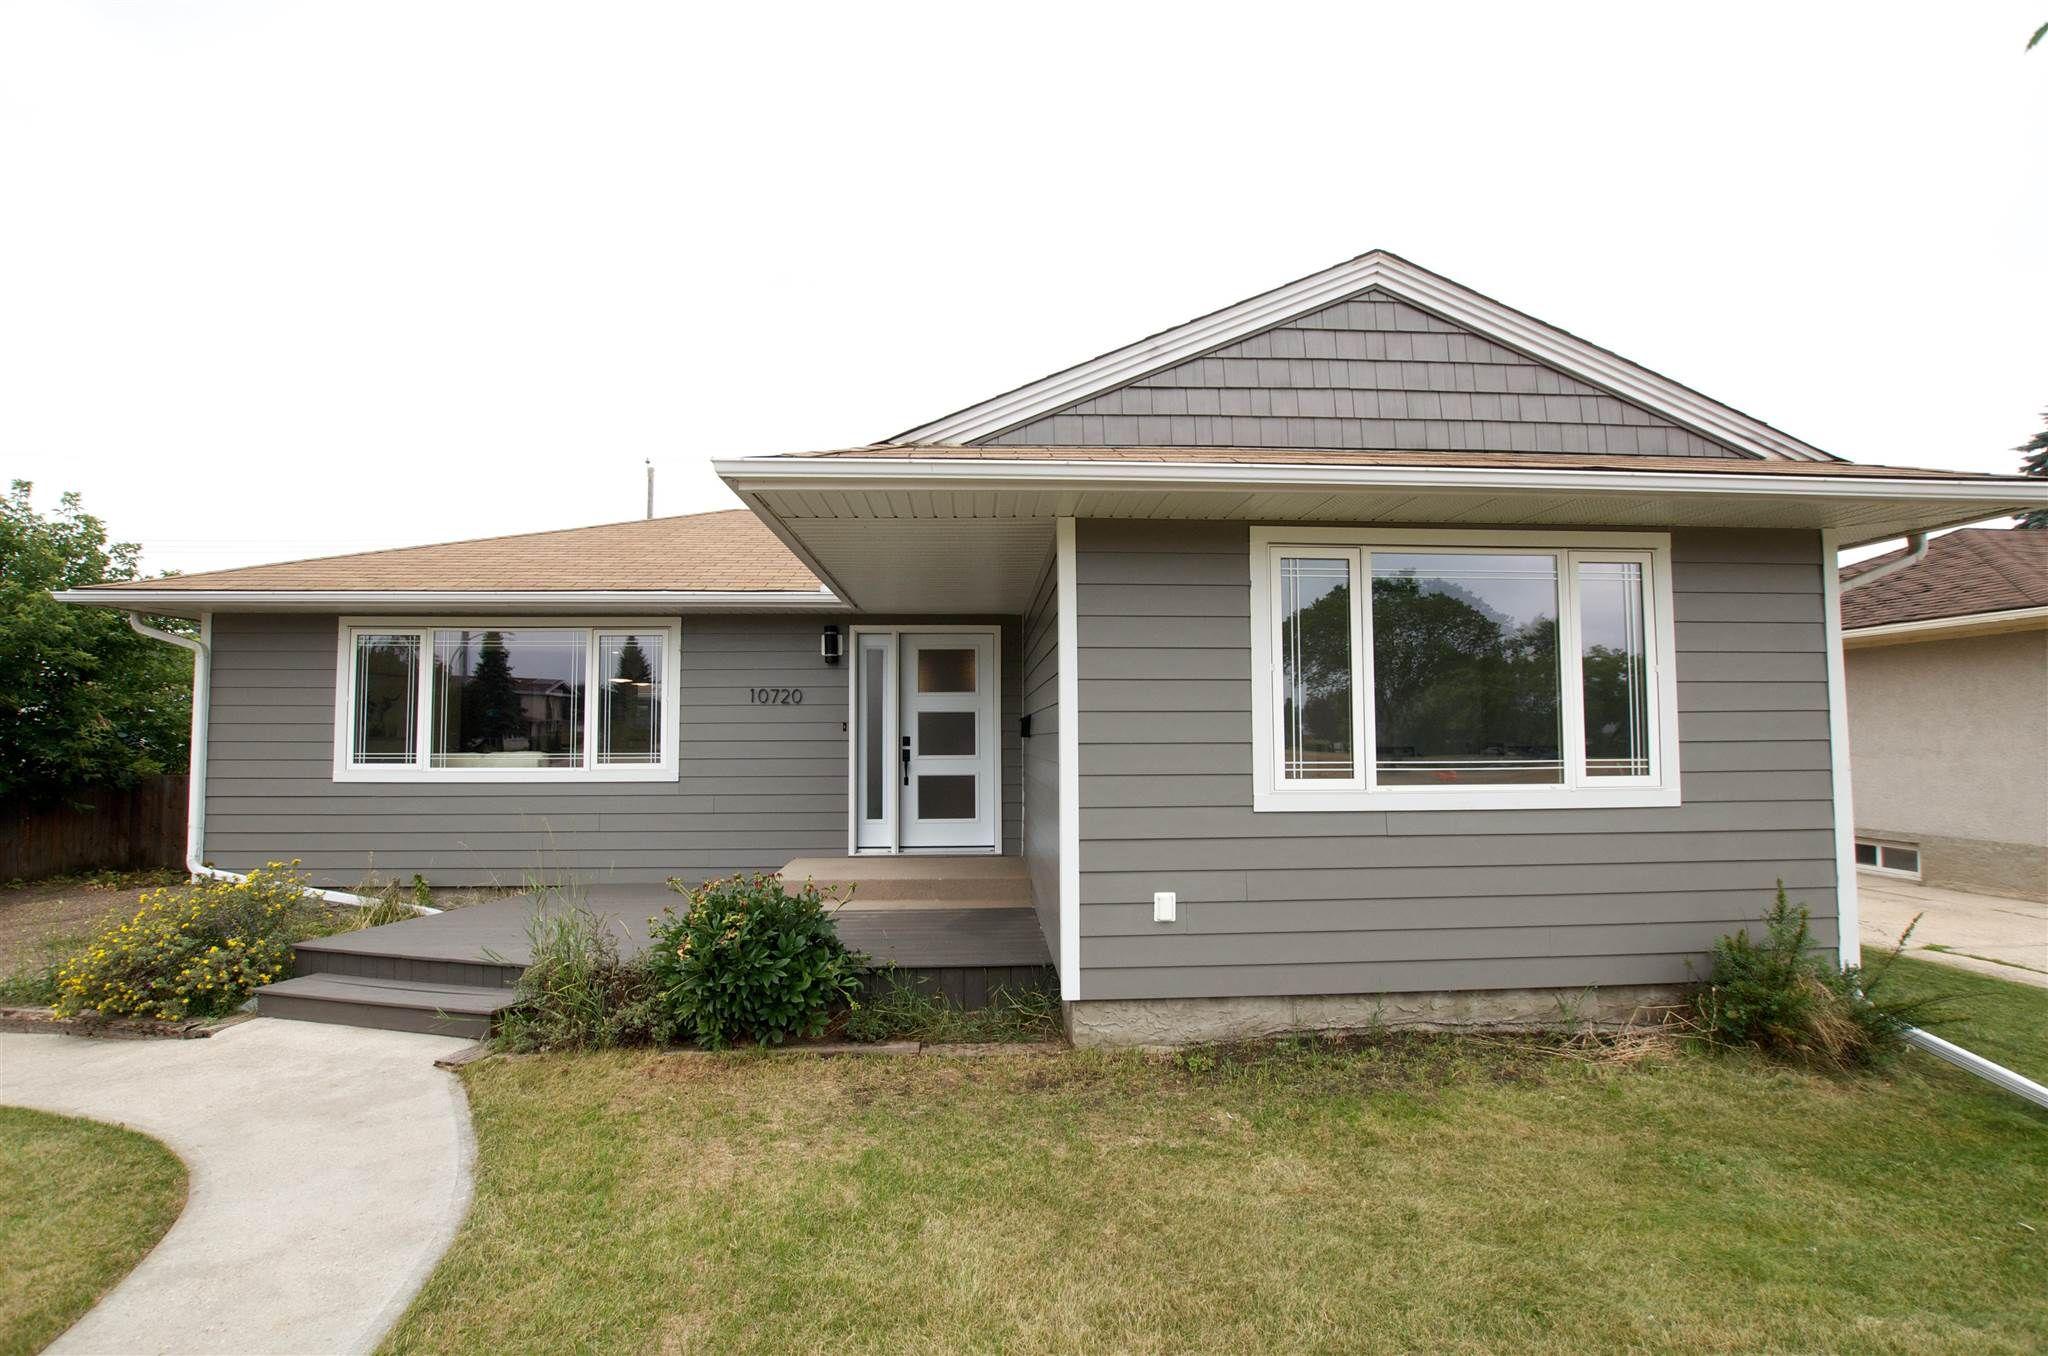 Main Photo: 10720 47 Street in Edmonton: Zone 19 House for sale : MLS®# E4255263